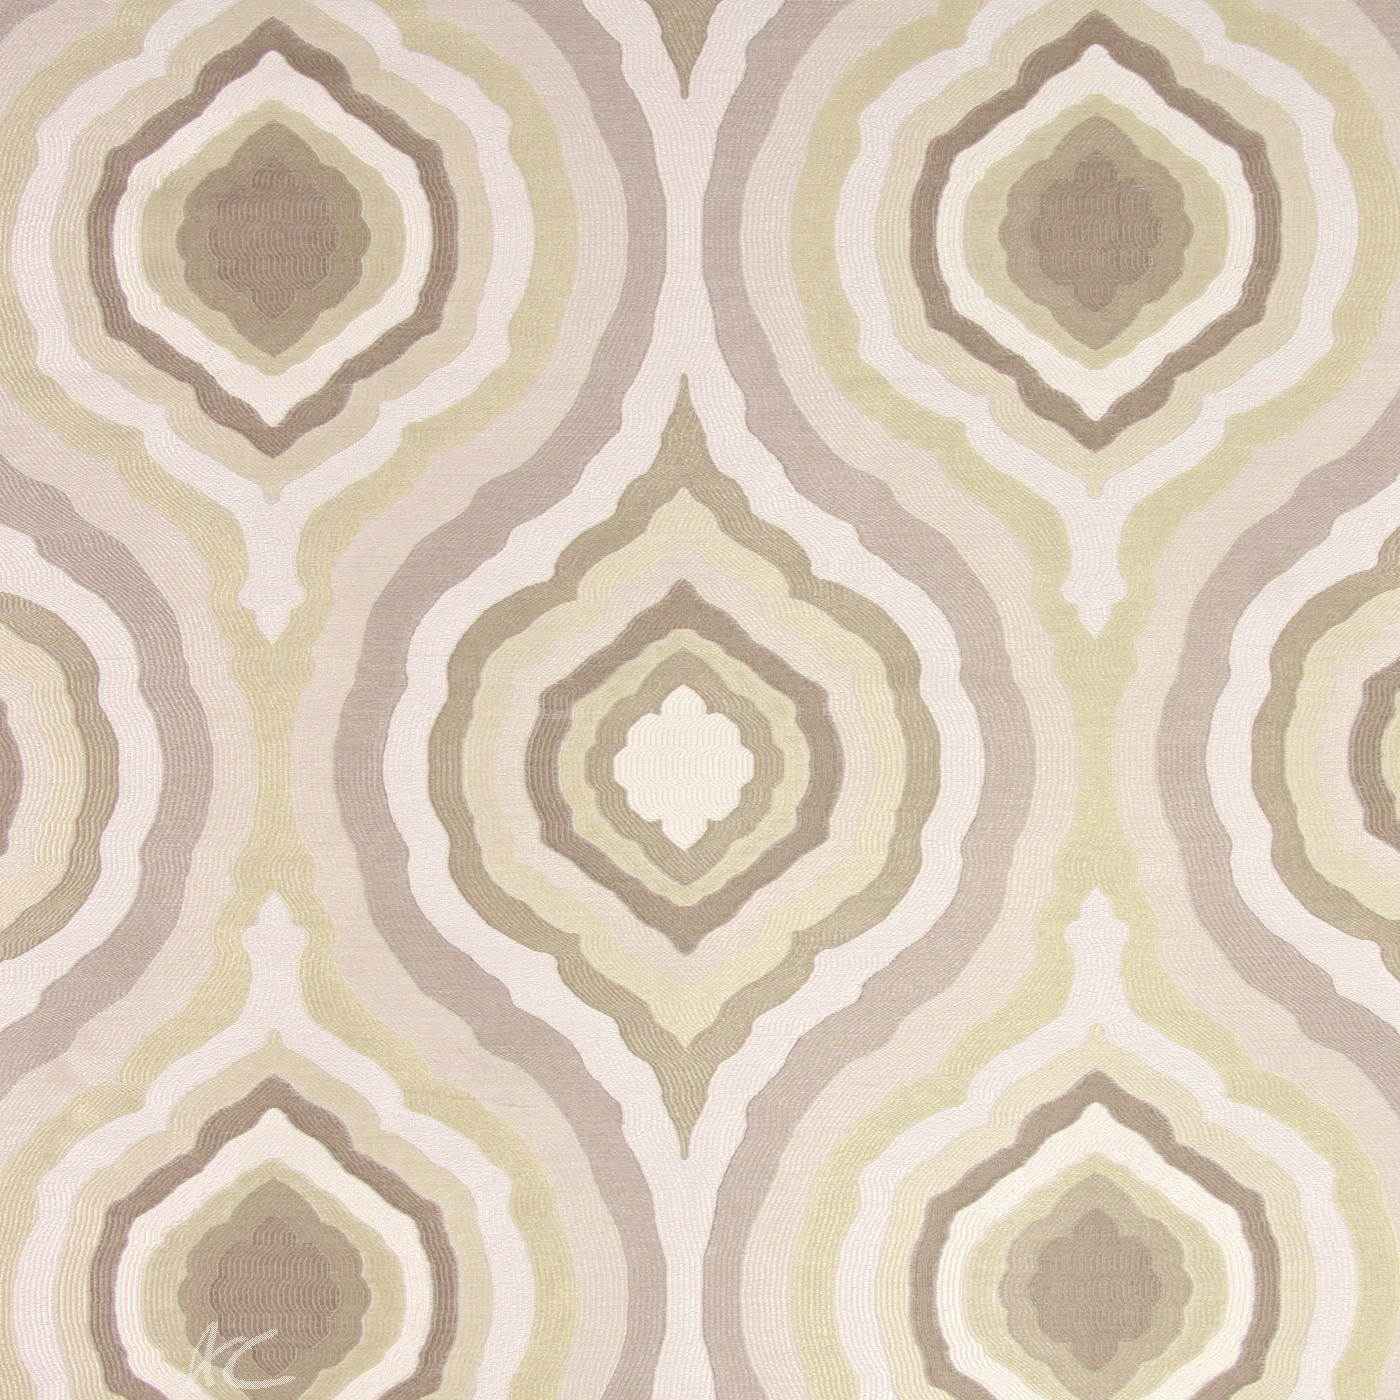 Platinum Magnesium Oyster Cushion Covers